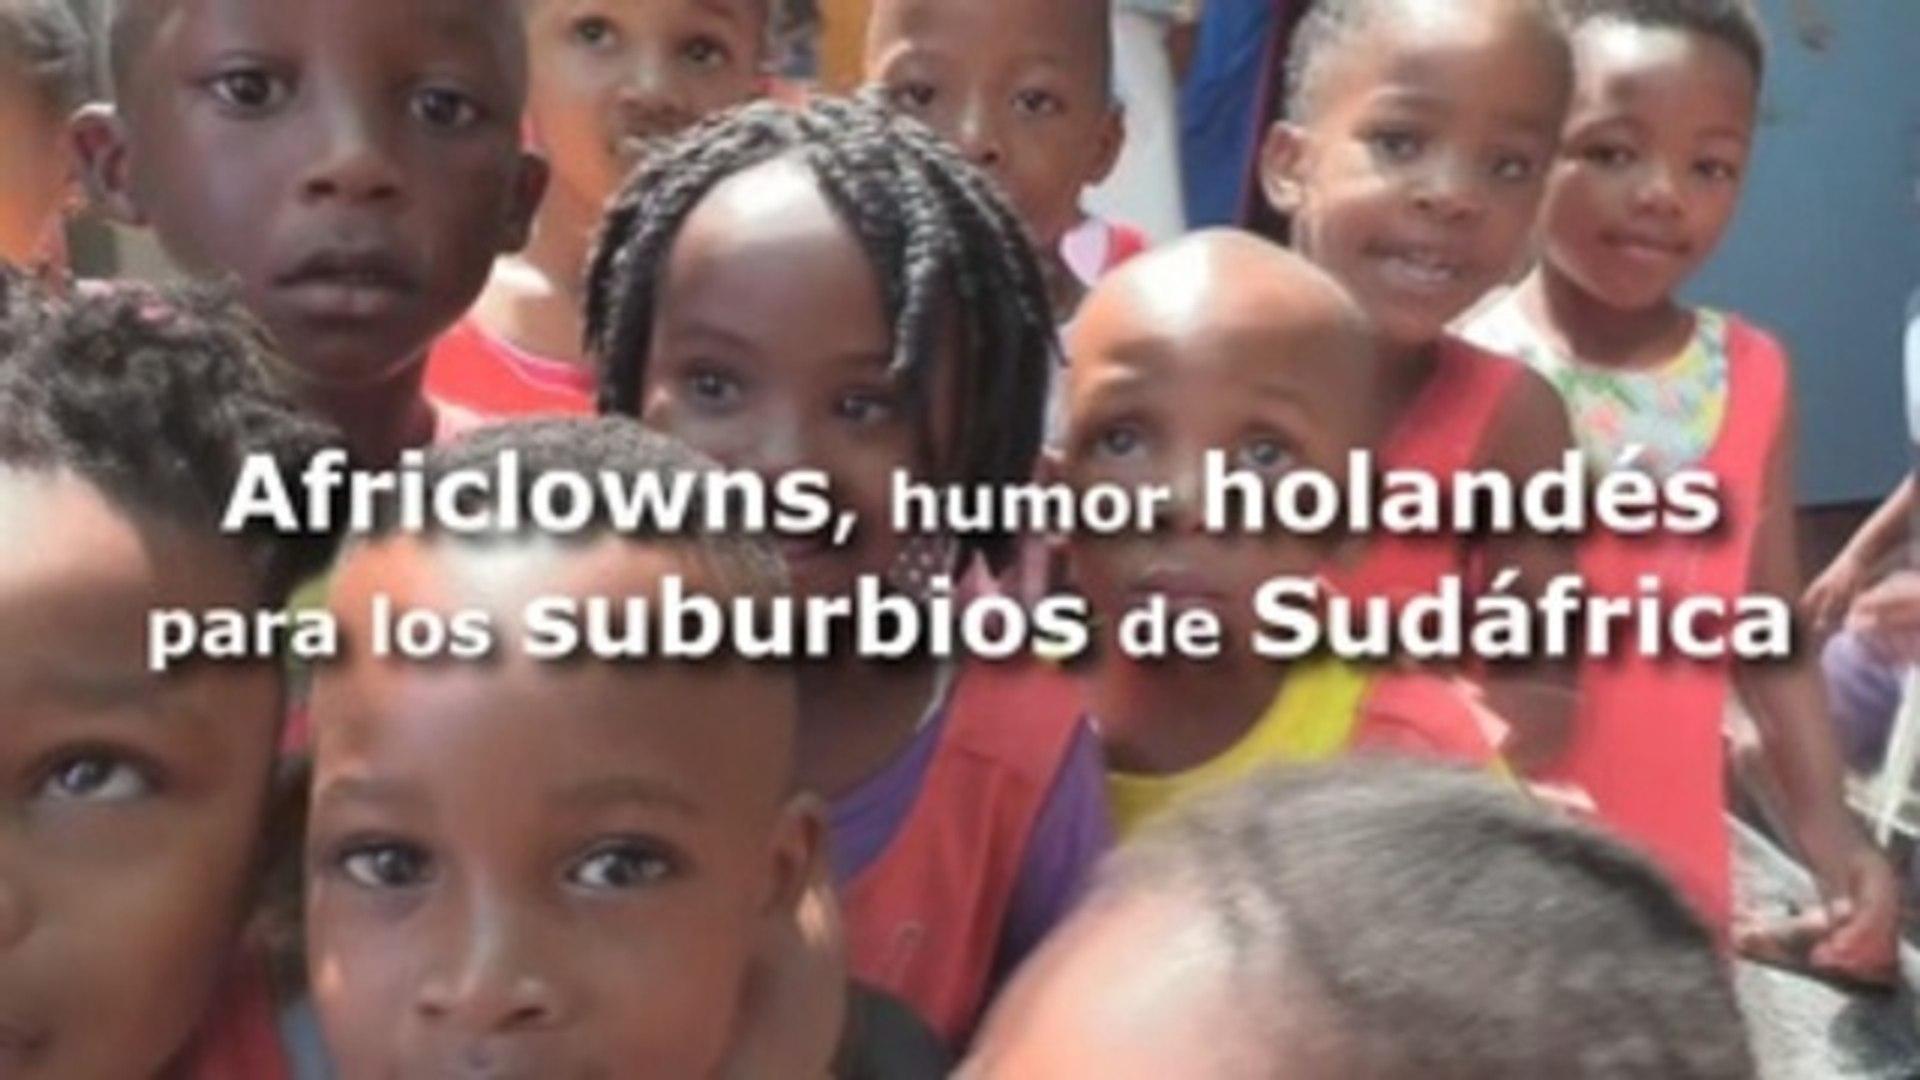 Africlowns, humor holandés para los suburbios de Sudáfrica